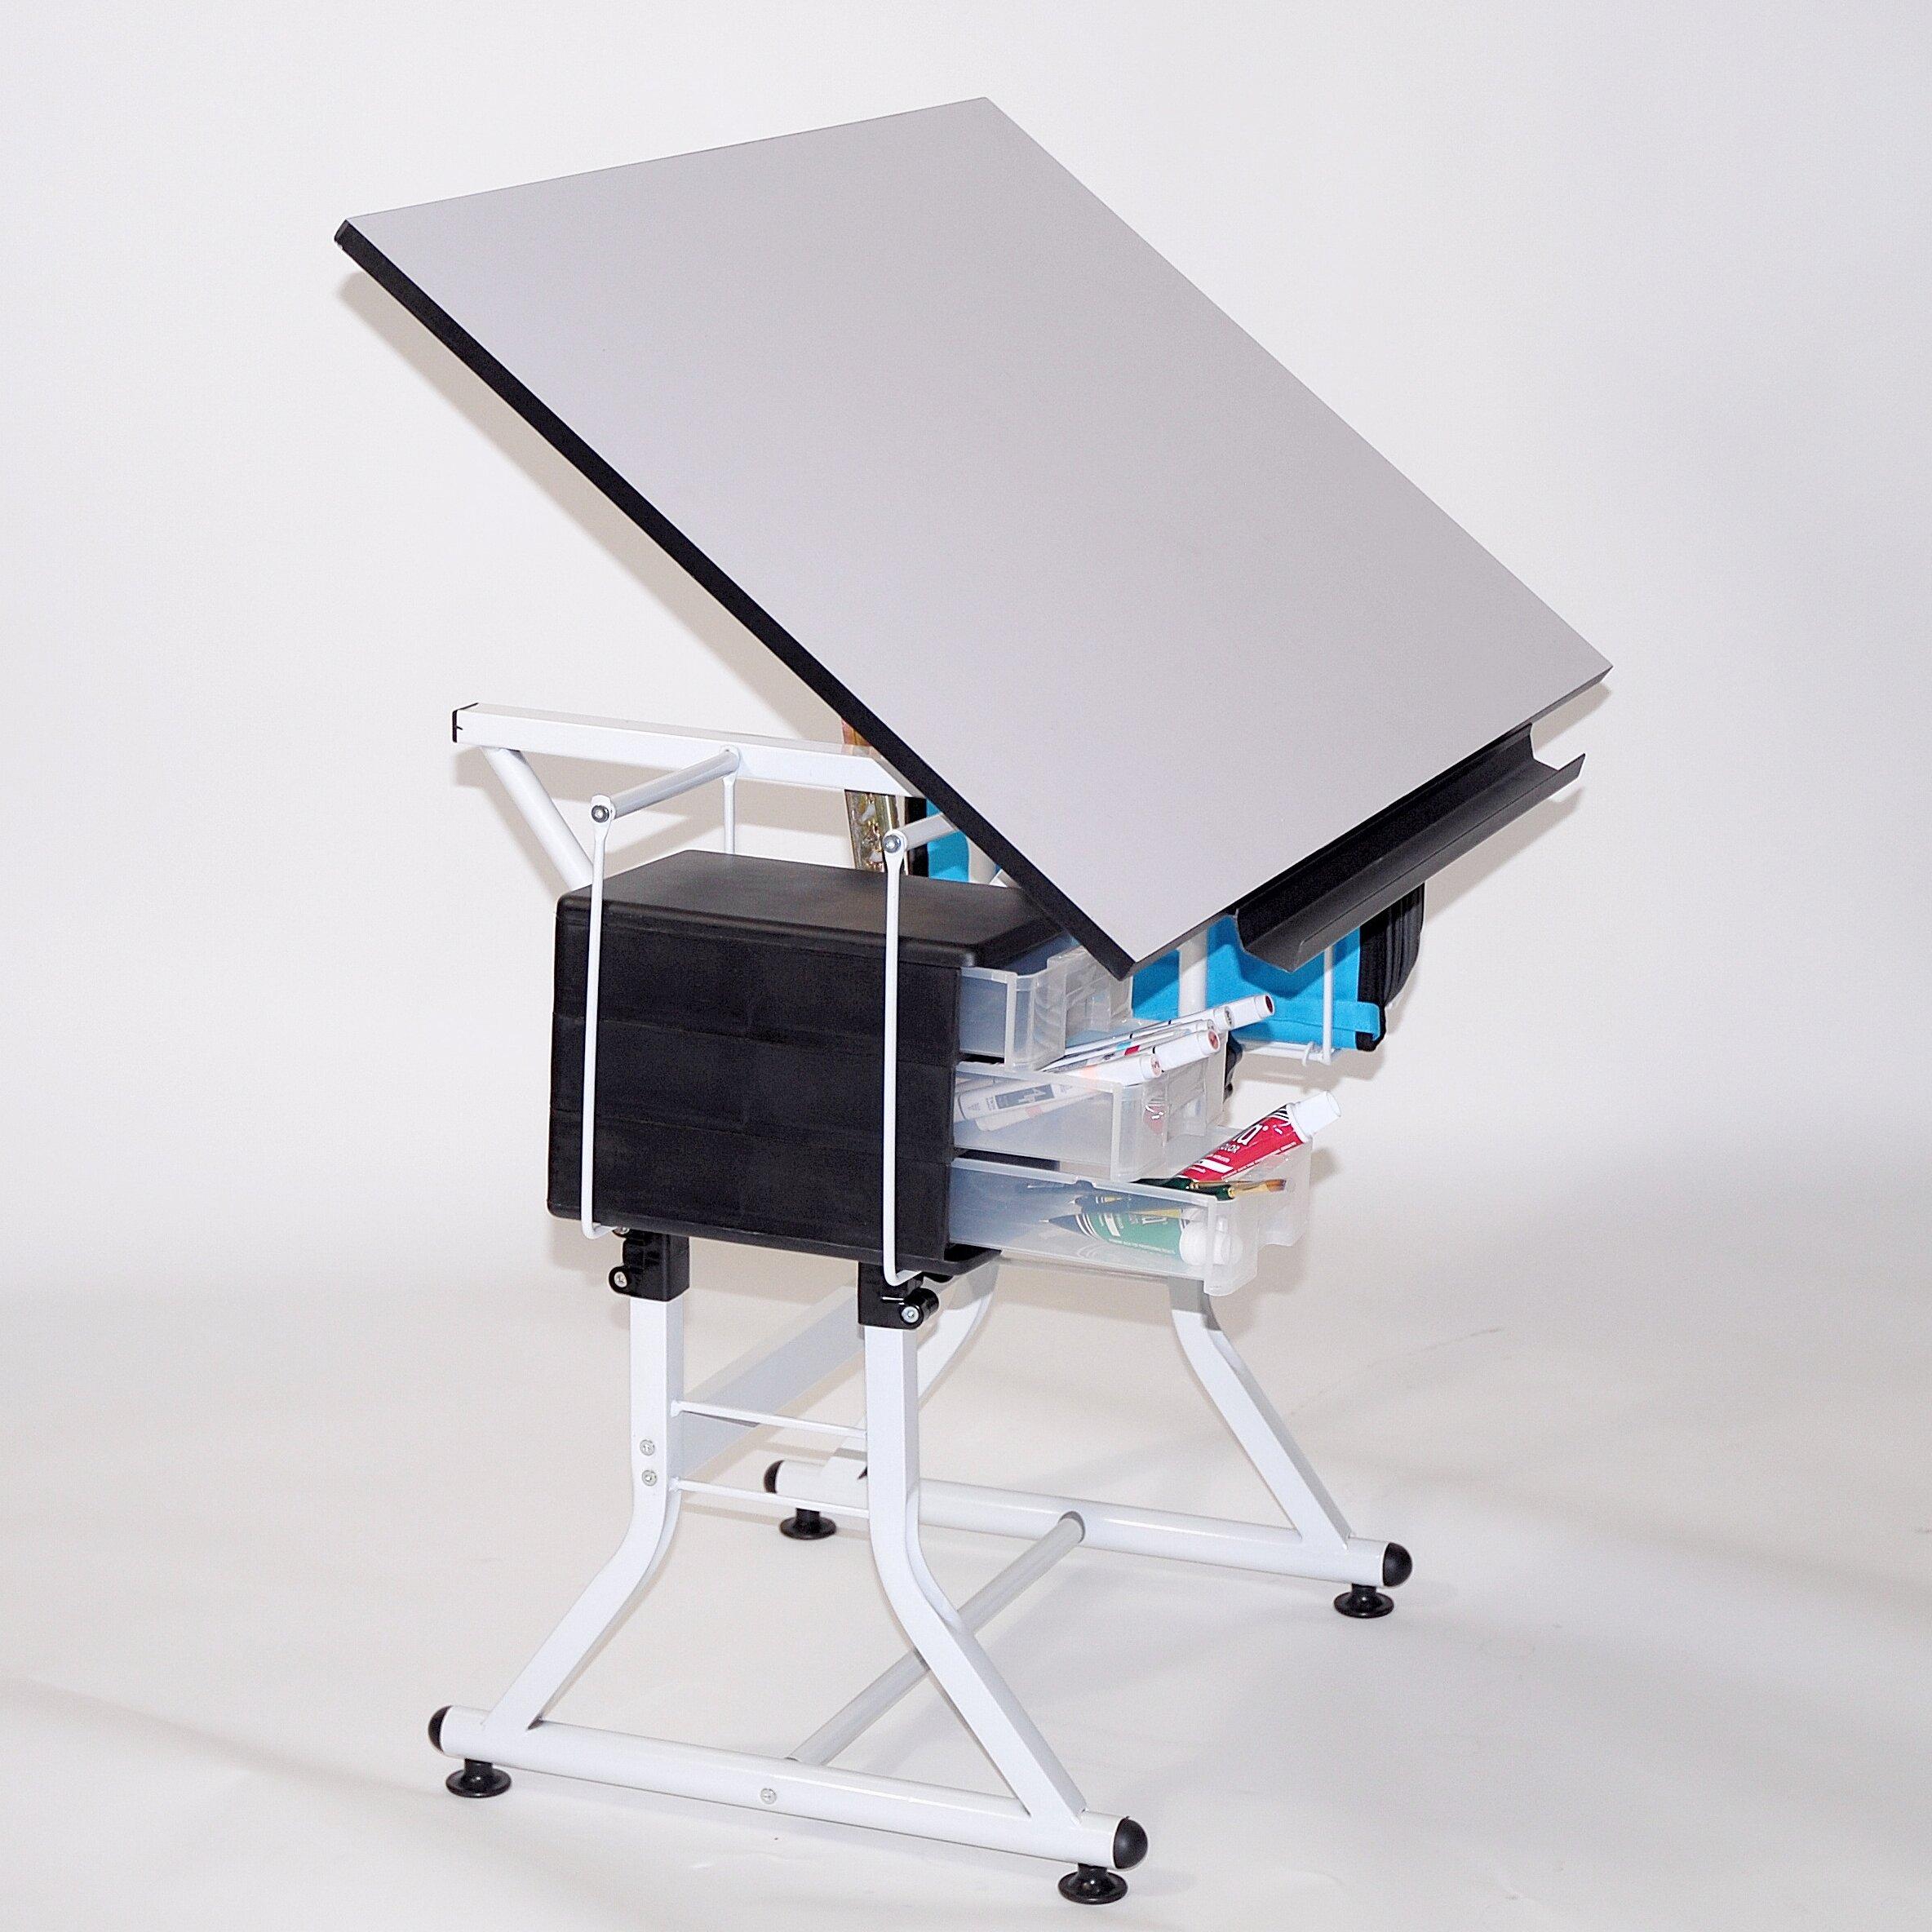 Modern drafting table - Ashley Creative 35 W X 23 D Drafting Table